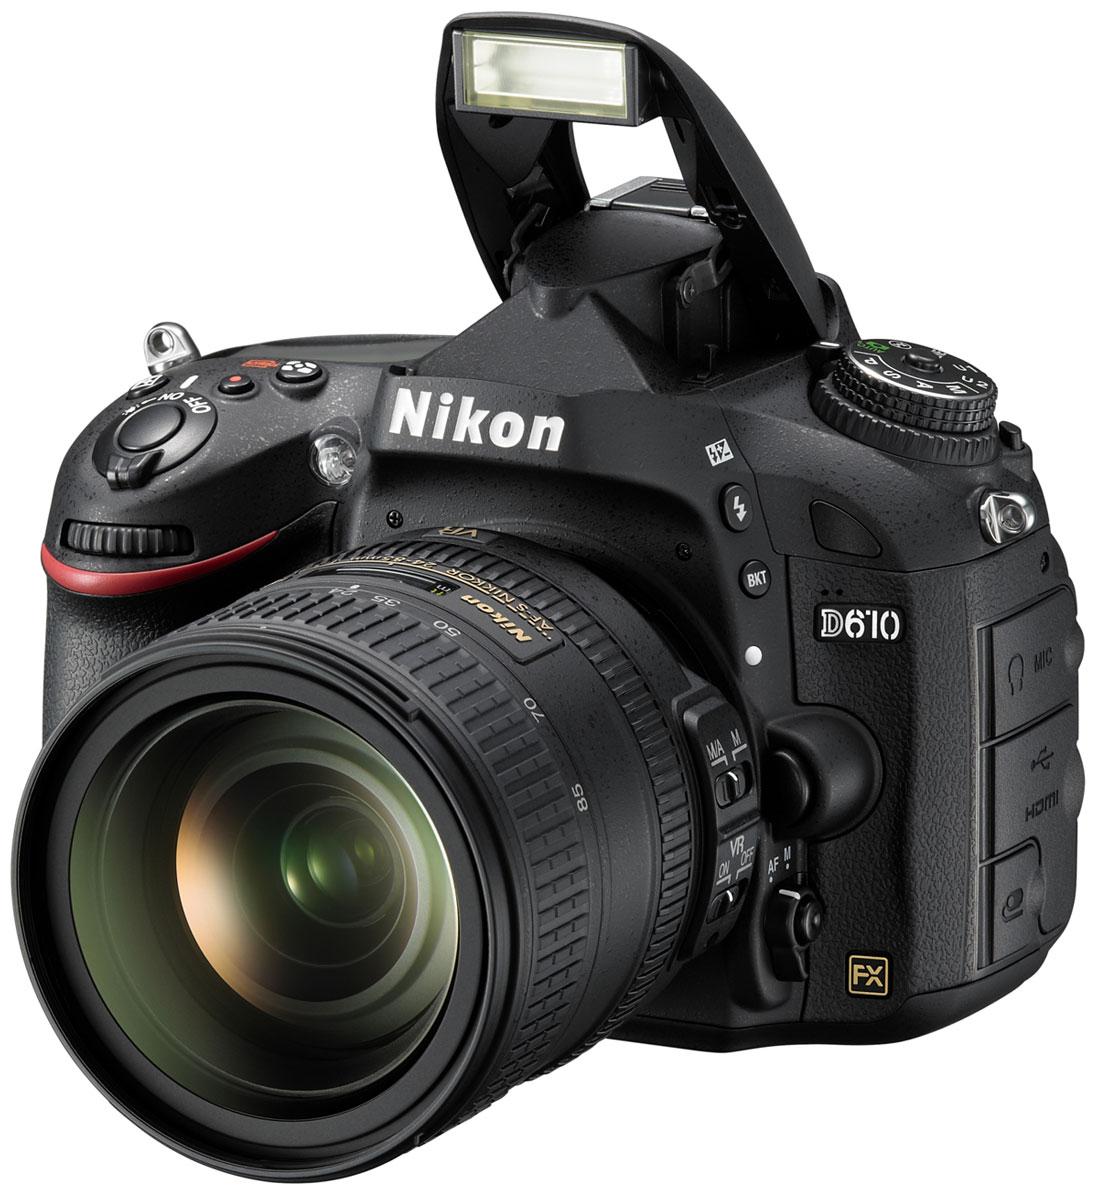 Nikon D610 Kit 24-85 цифровая зеркальная фотокамера VBA430K001